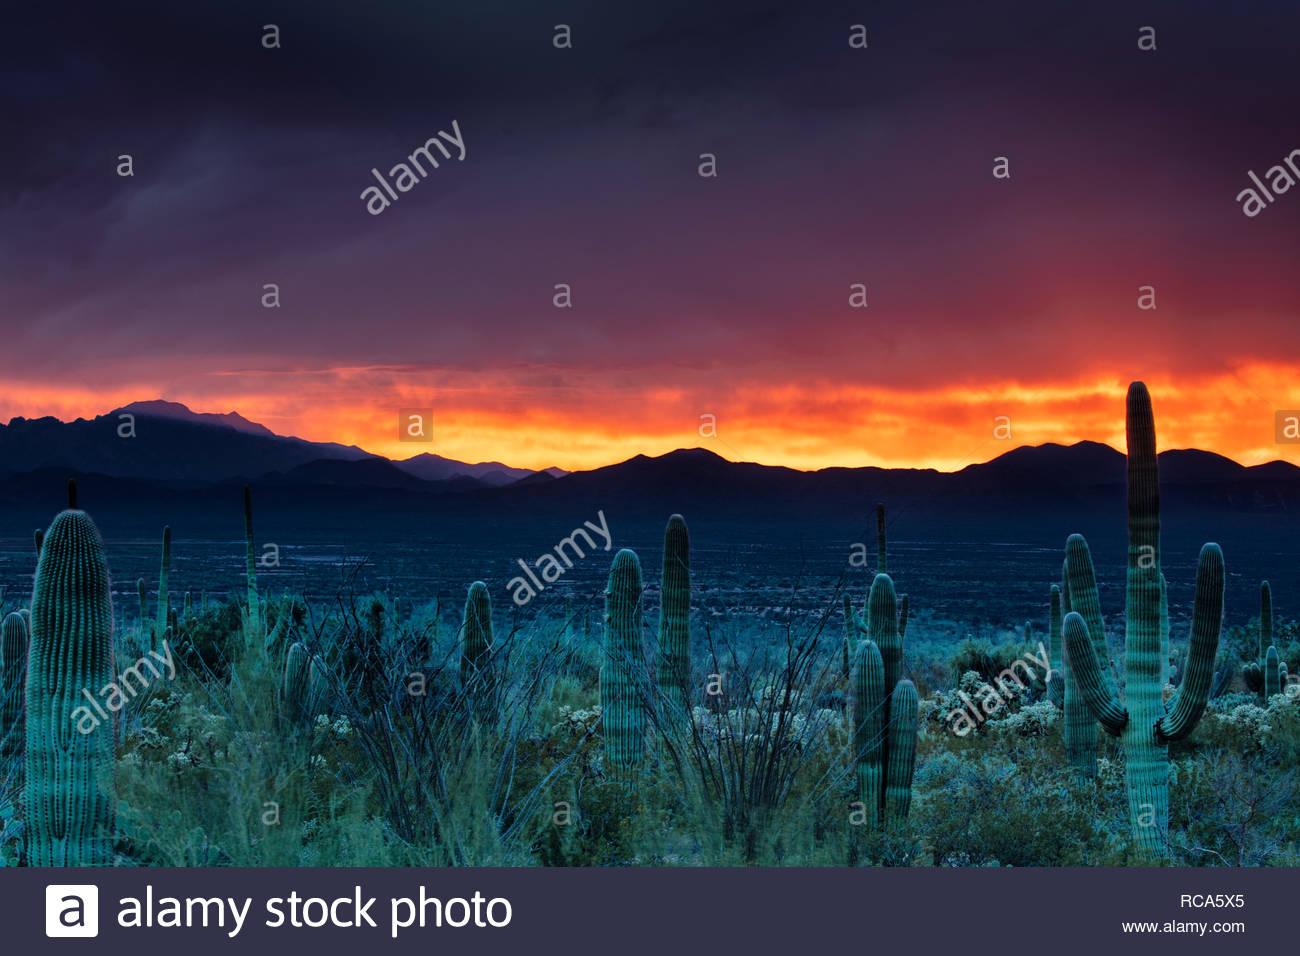 A fiery, late-autumn sunset colors the skies over the Coyote Mountains and the saguaros (Carnegiea gigantea) of Saguaro National Park near Tucson, Ari - Stock Image